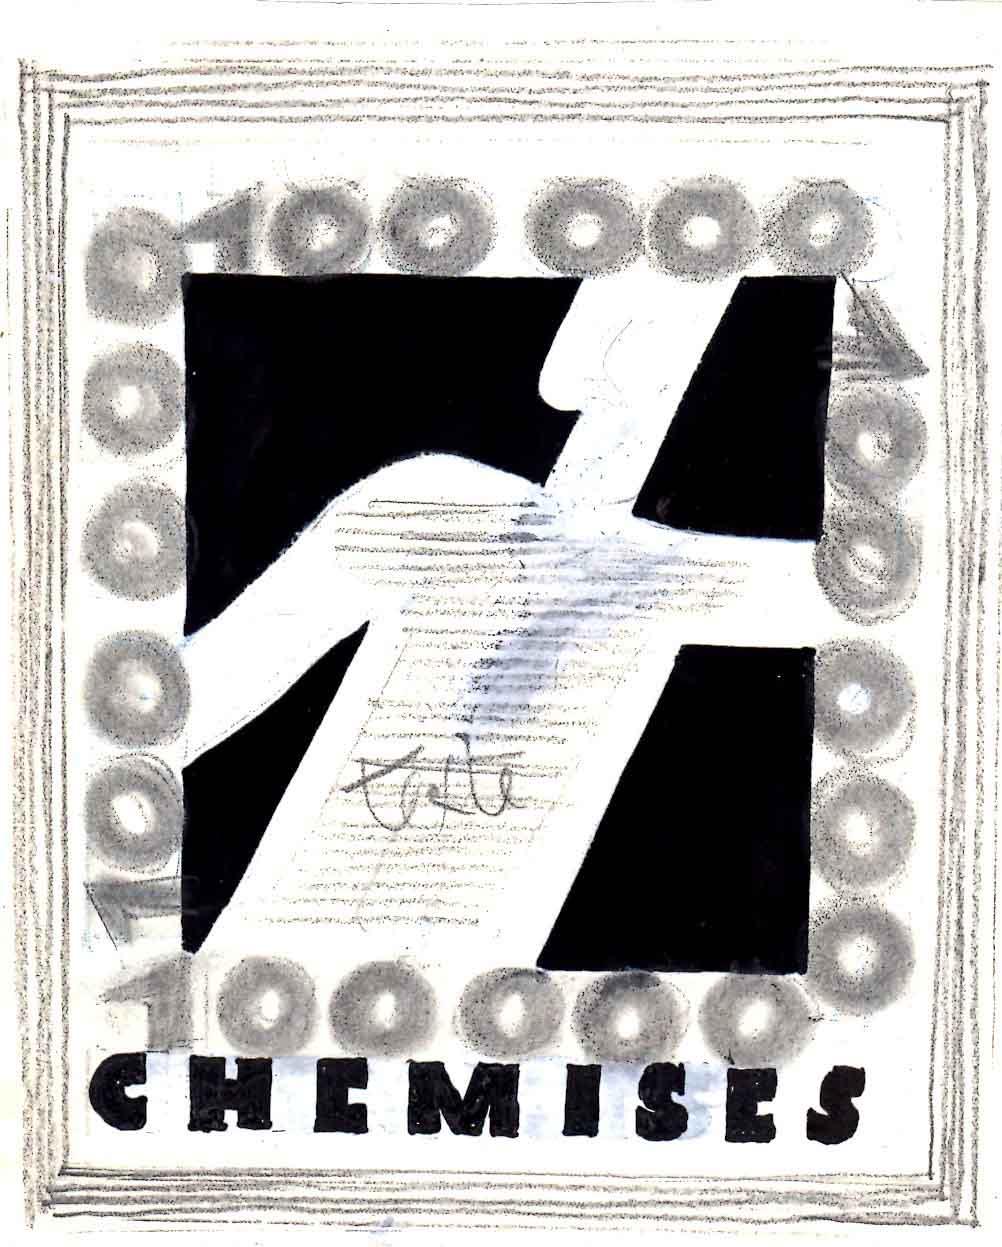 Jacques Grange | 100 000 chemises |